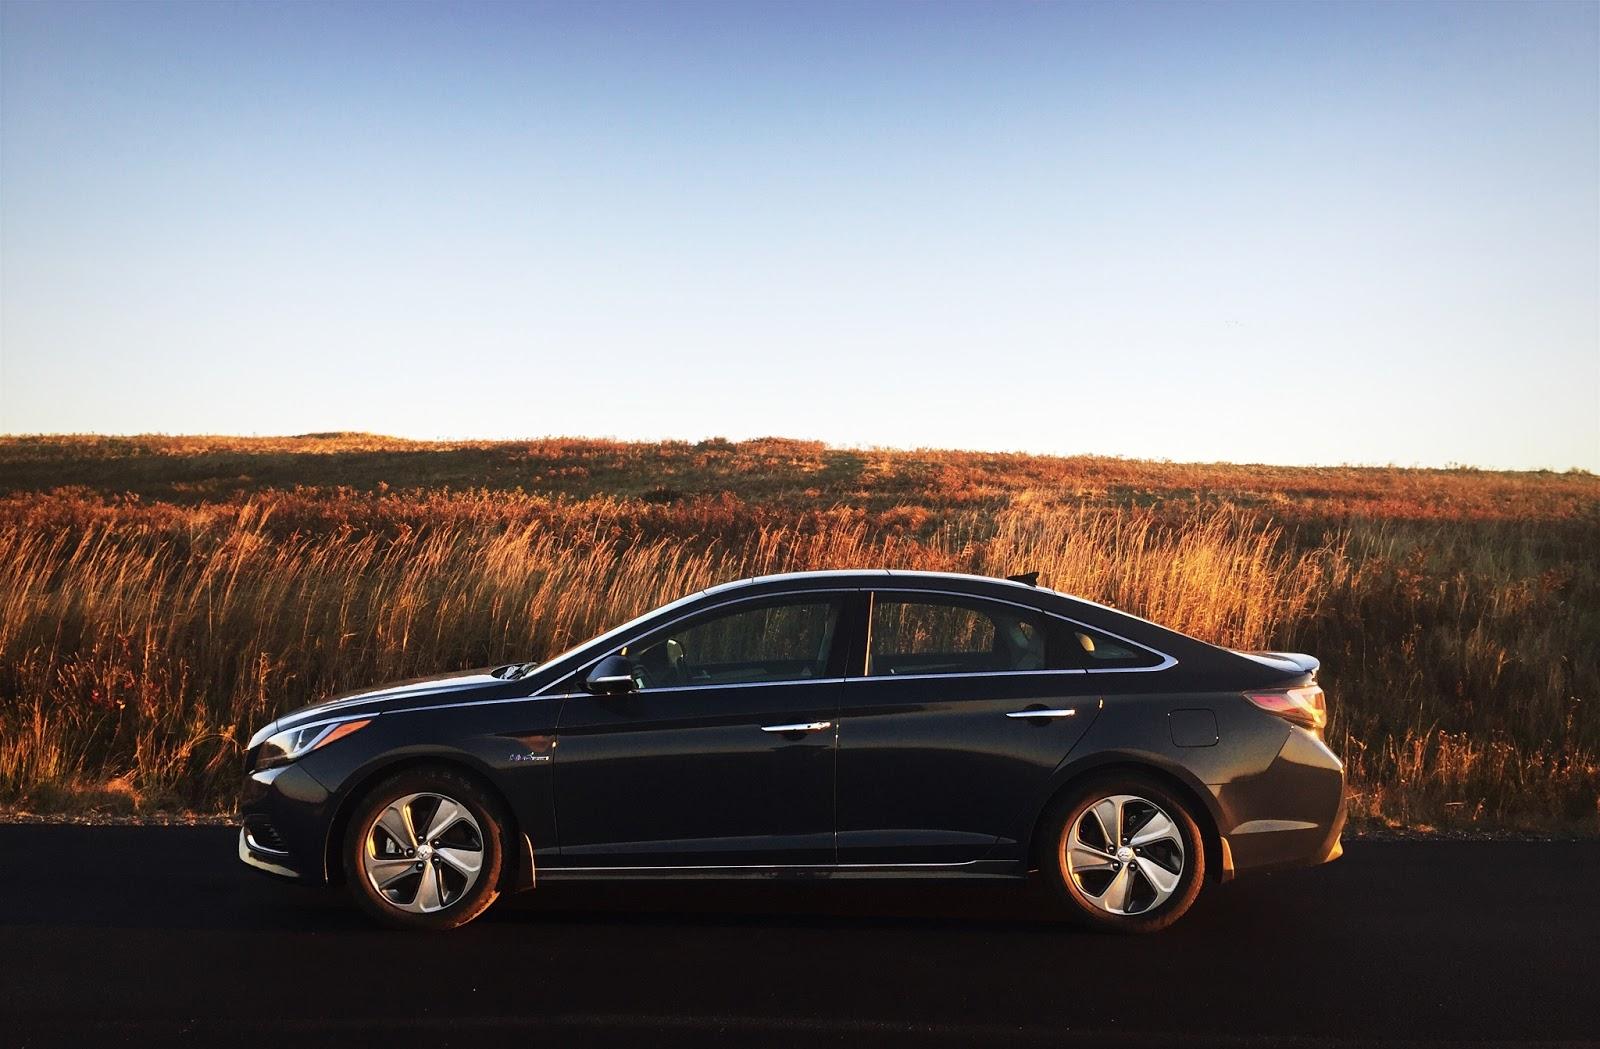 2016 Hyundai Sonata Hybrid Limited Review Do The Fuel Savings Add